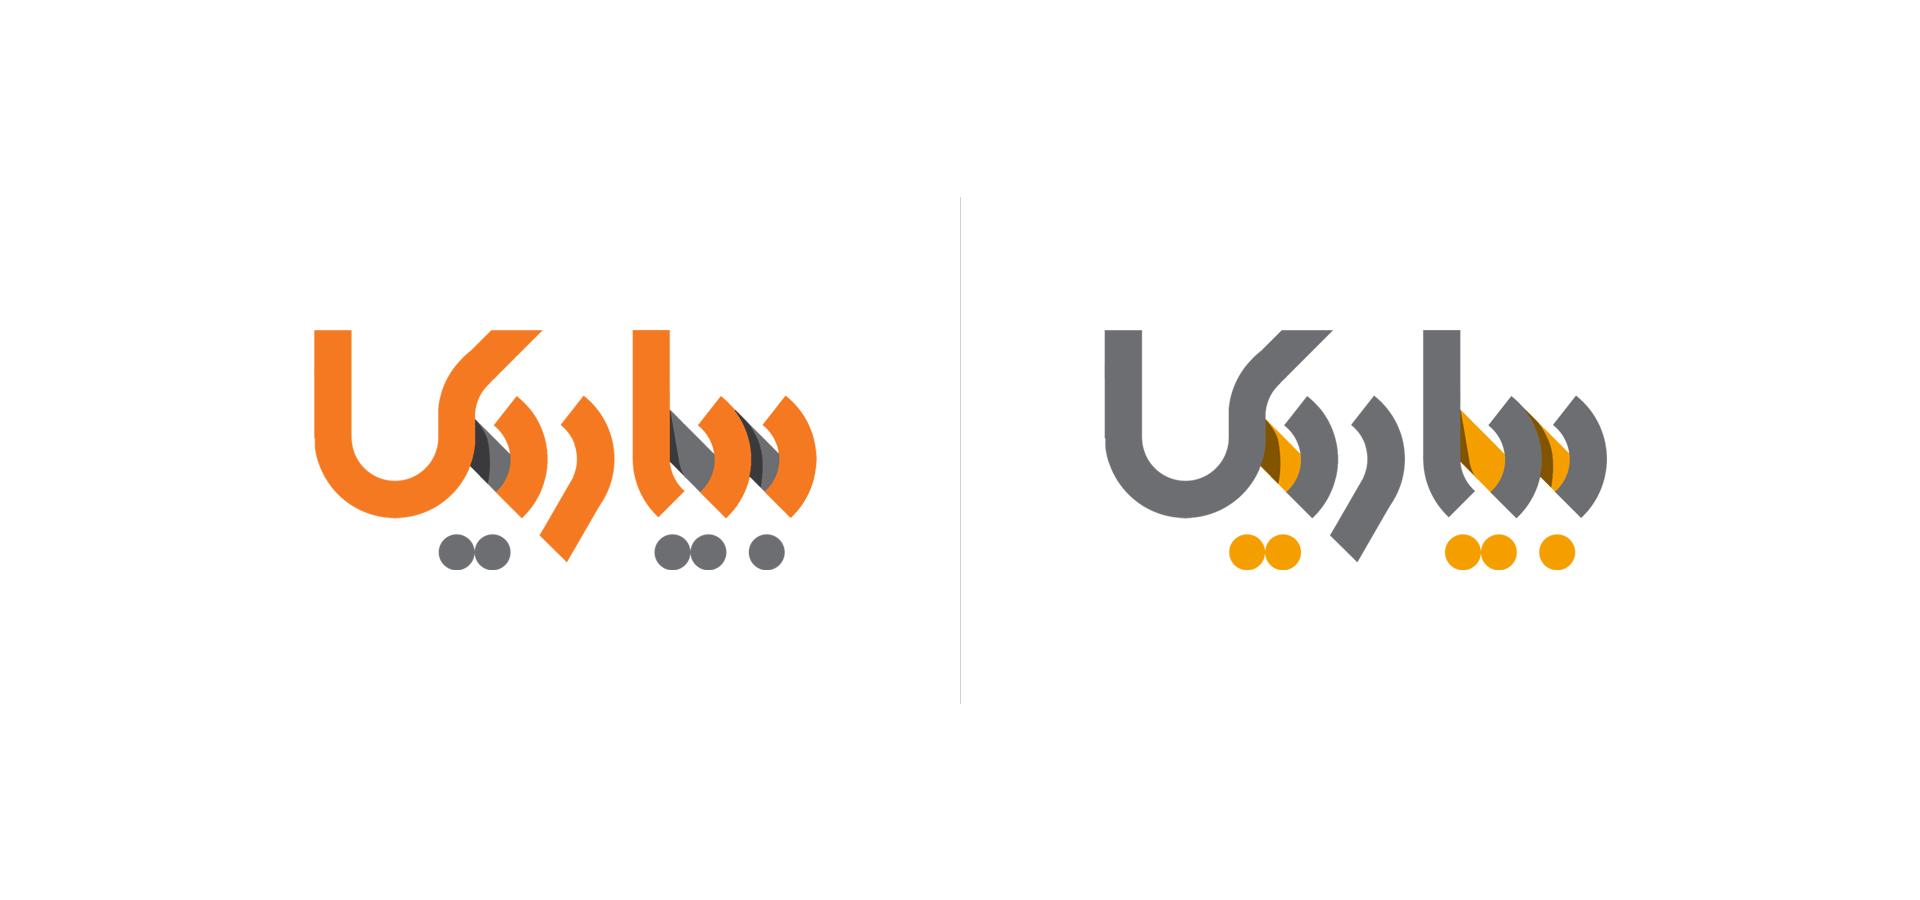 biarica logo design portfolio by vazirstudio.com